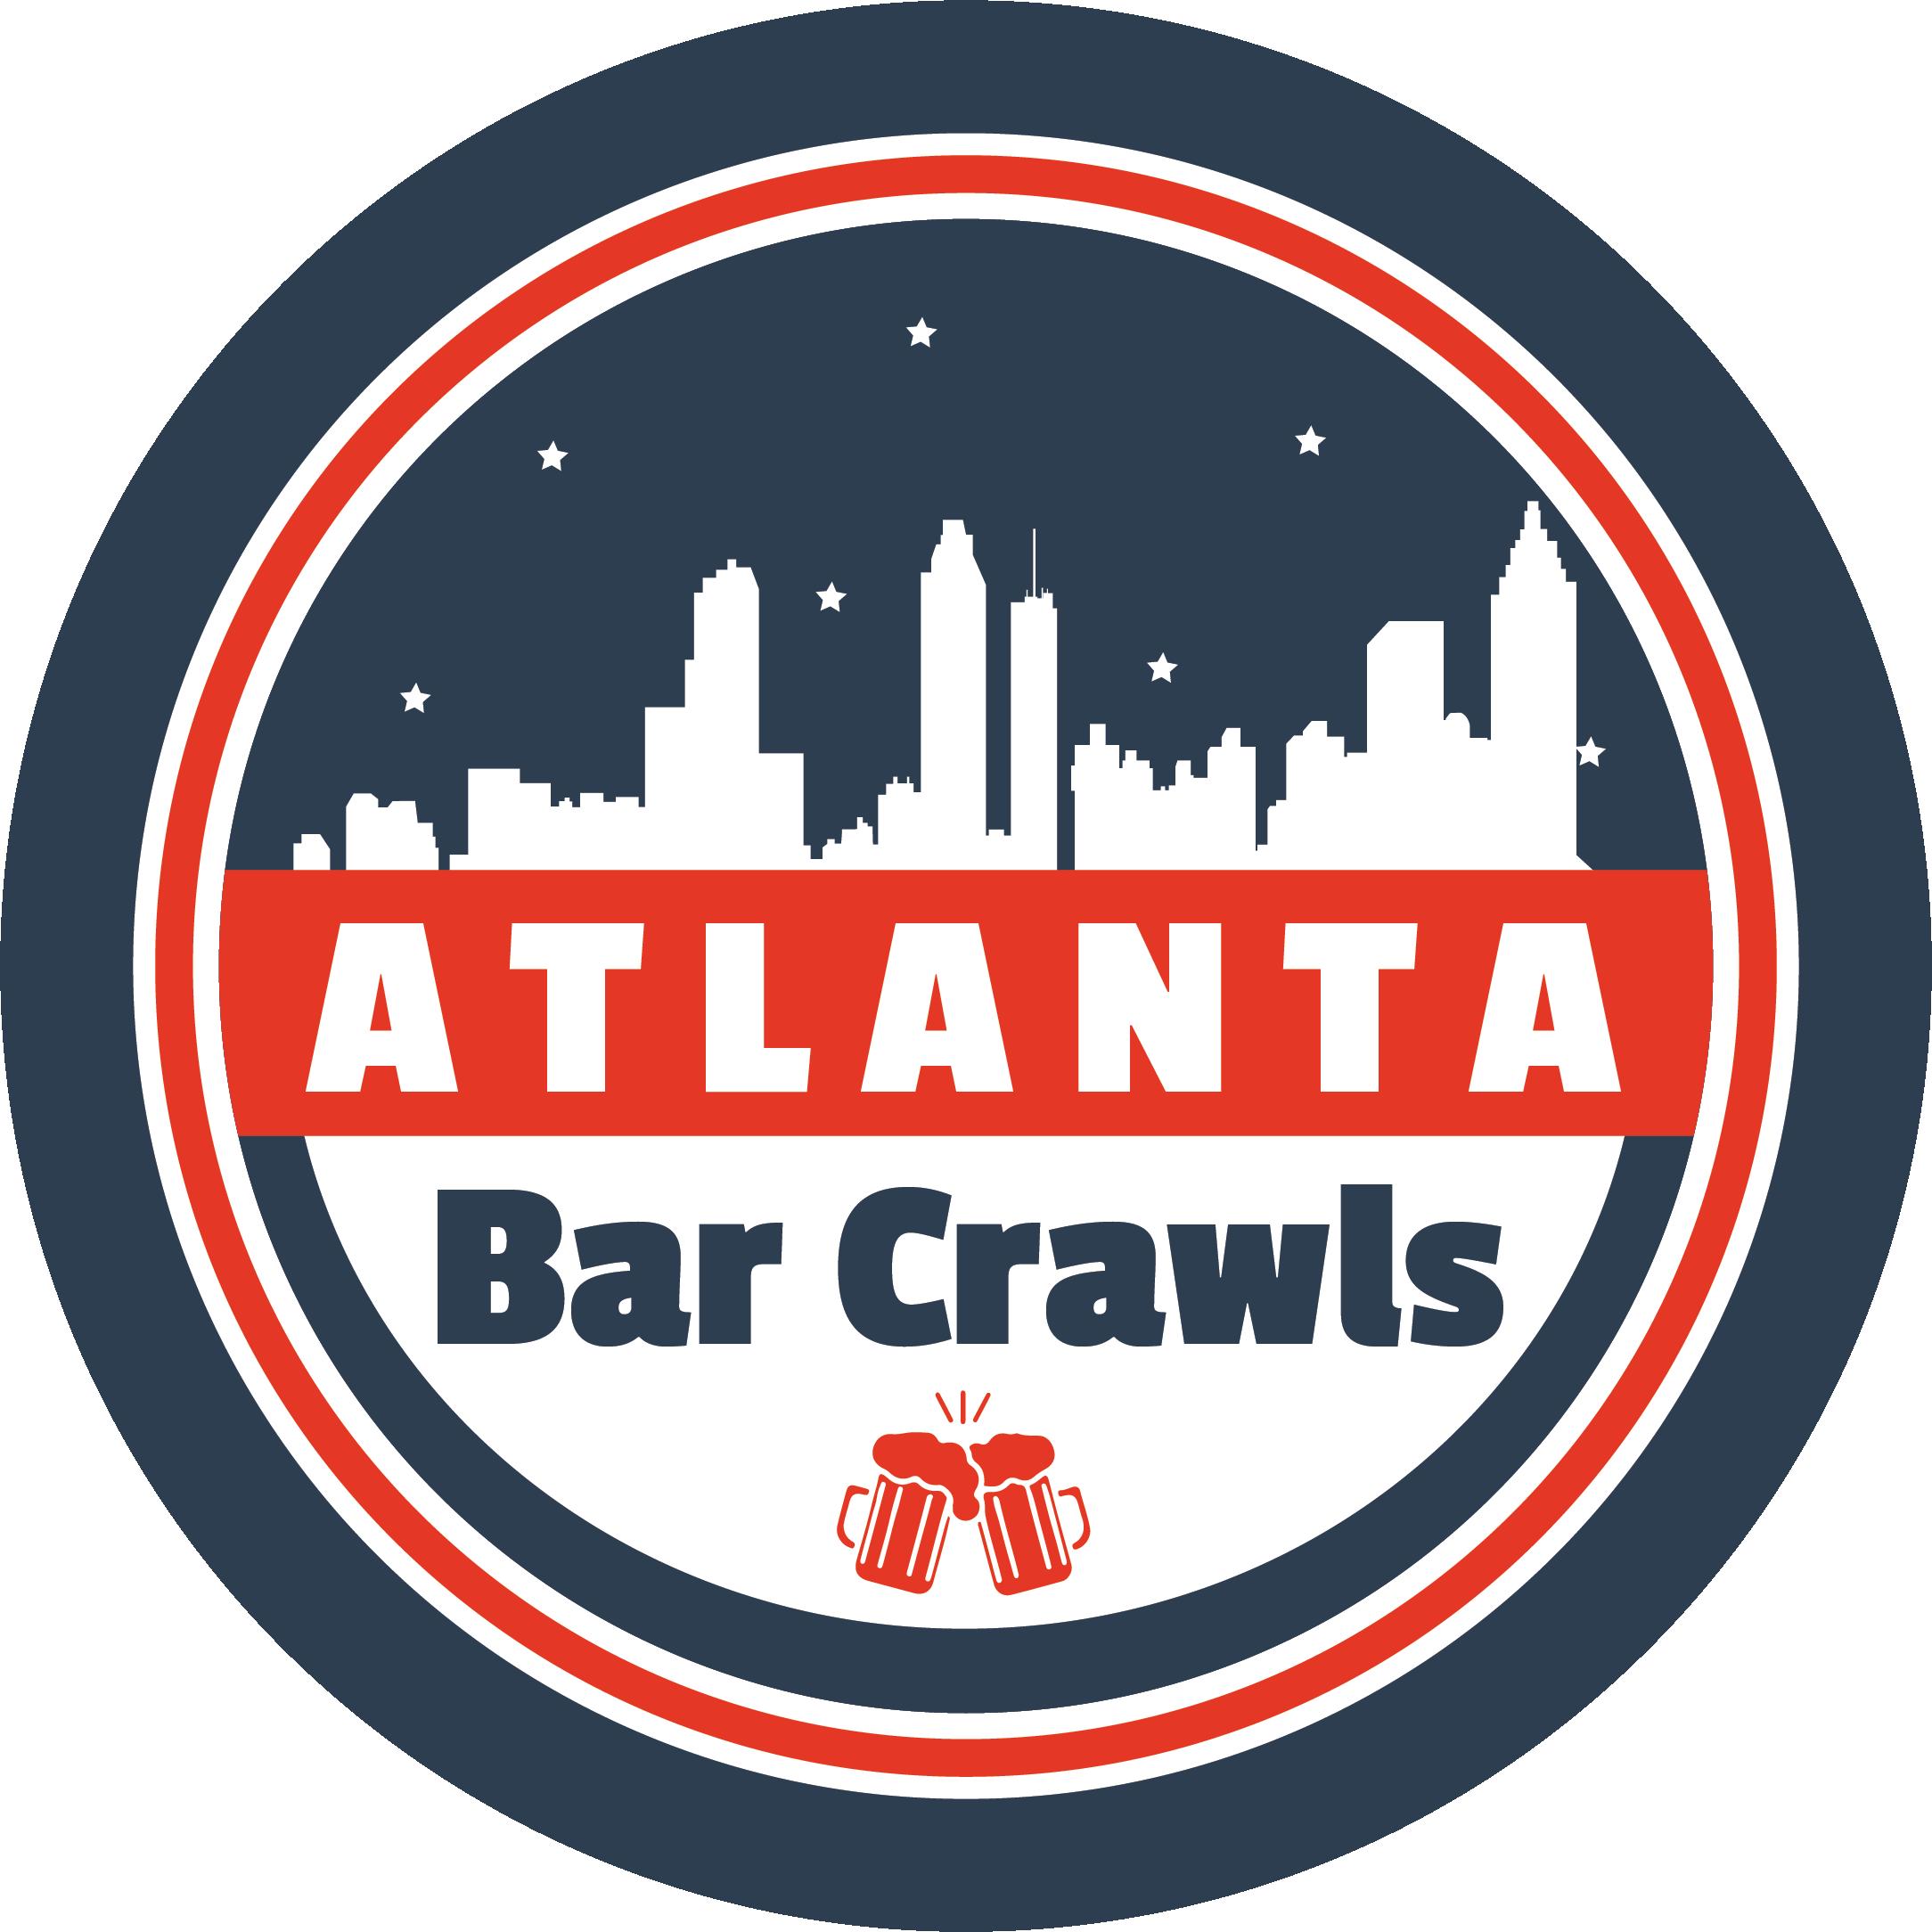 Atlanta Bar Crawls